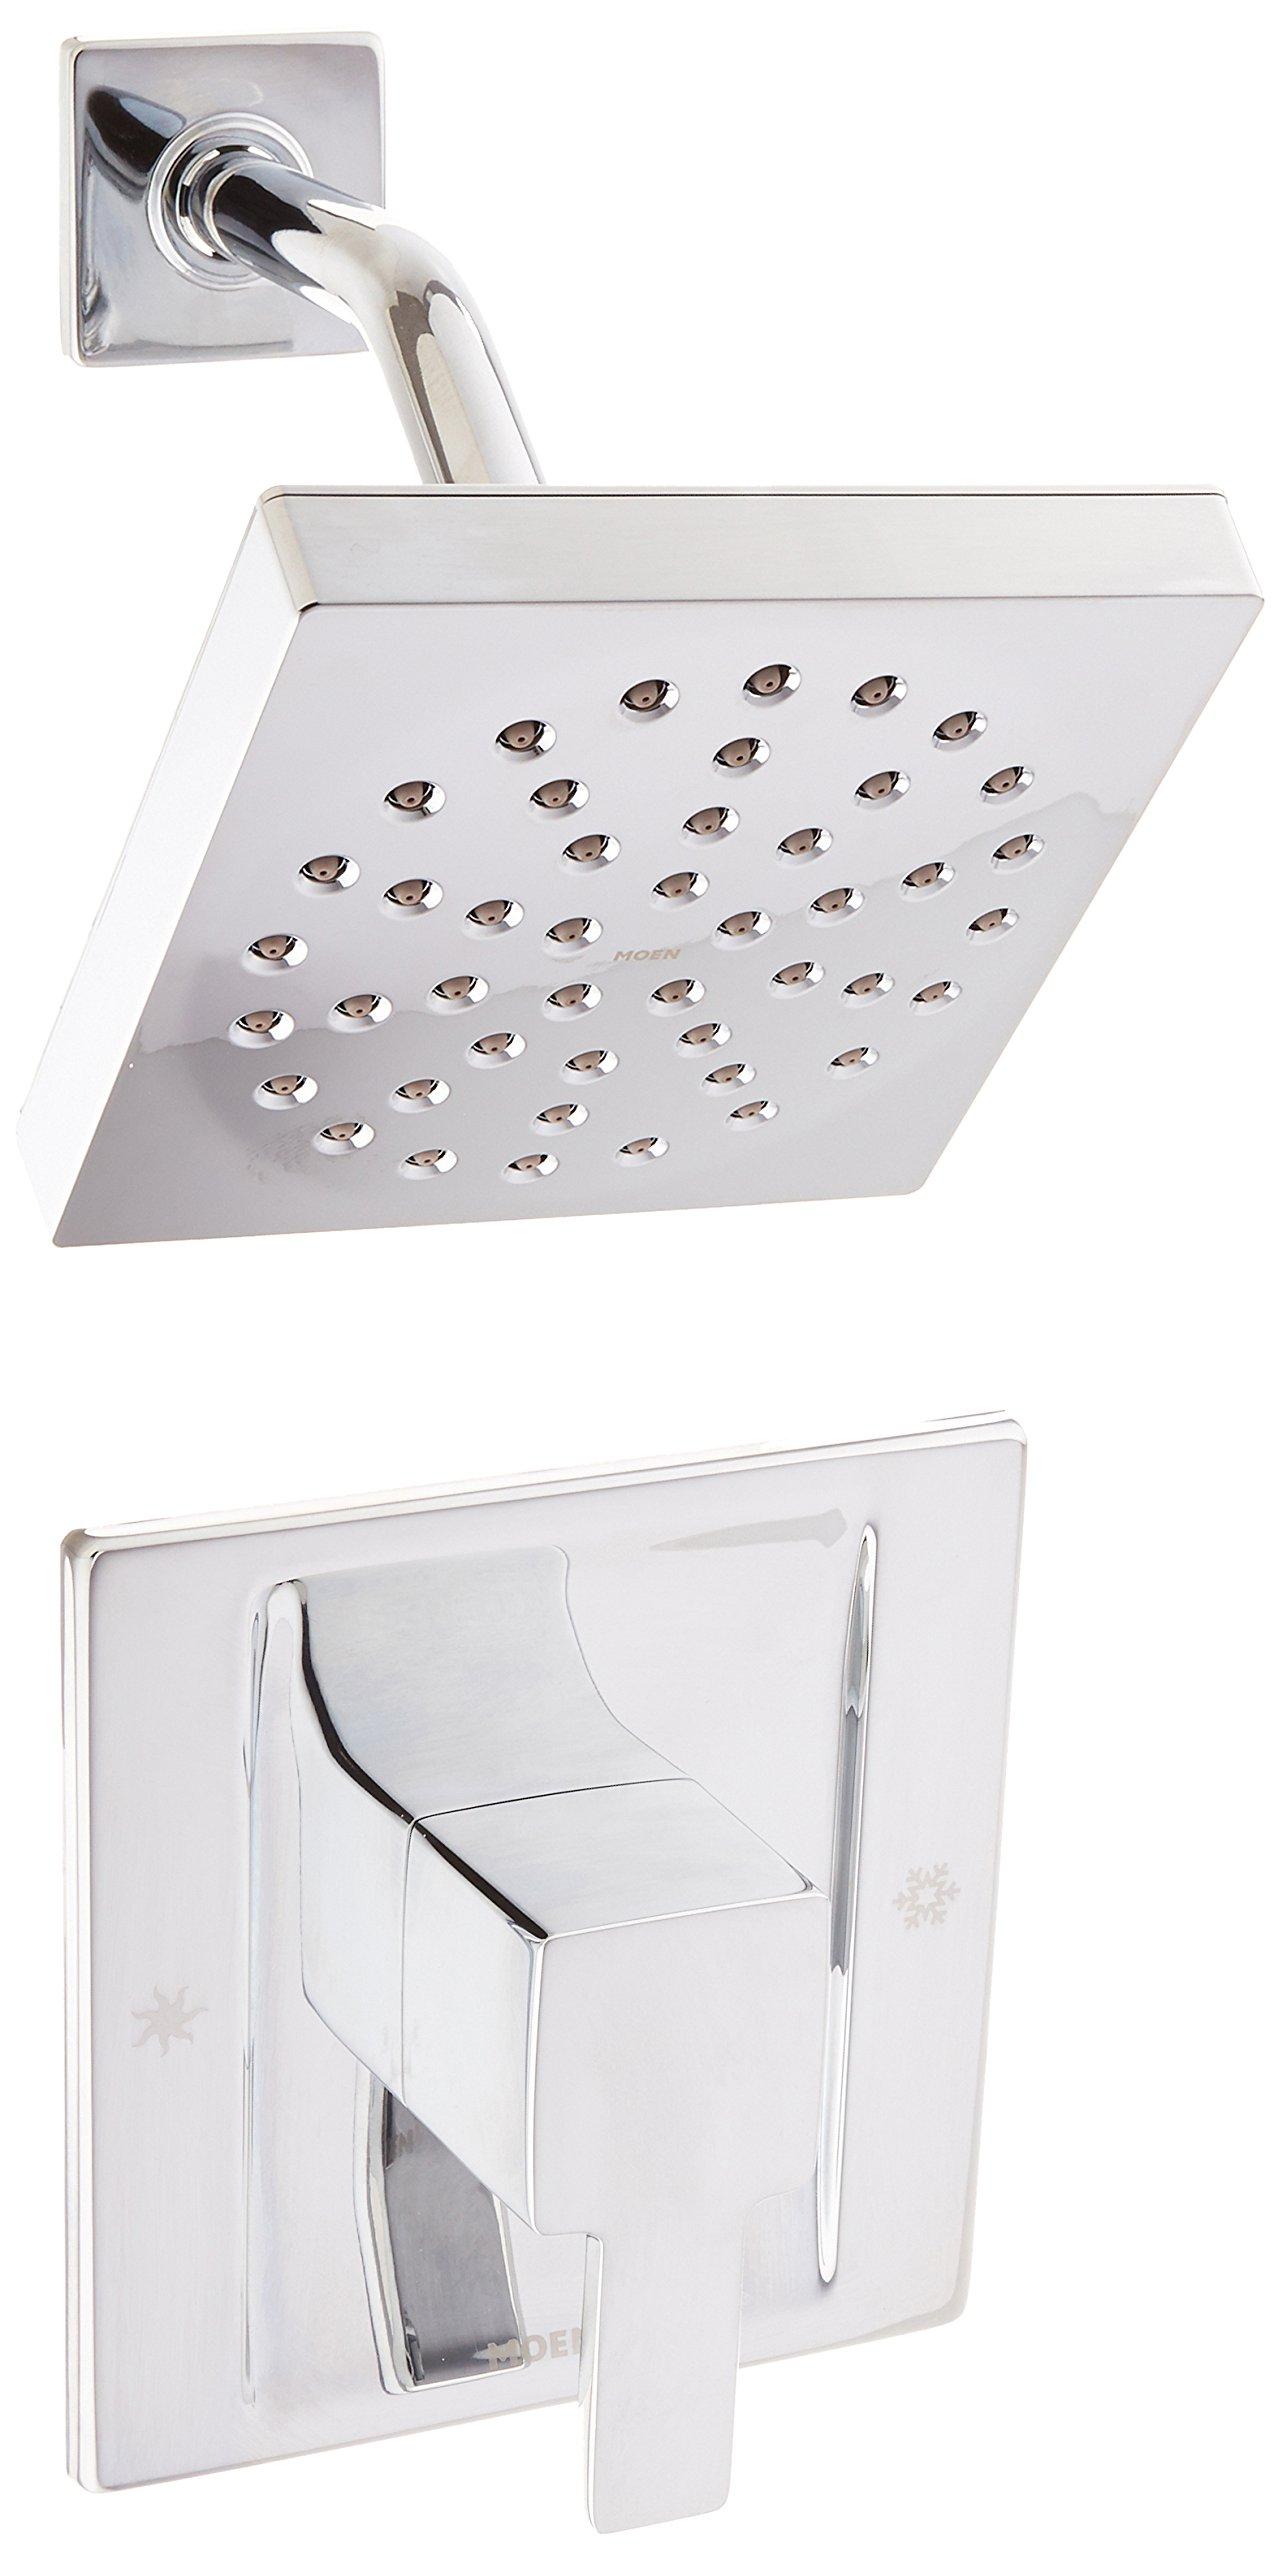 Moen TS3715 90 Degree Moentrol Shower Set without Moentrol Shower Valve, Chrome